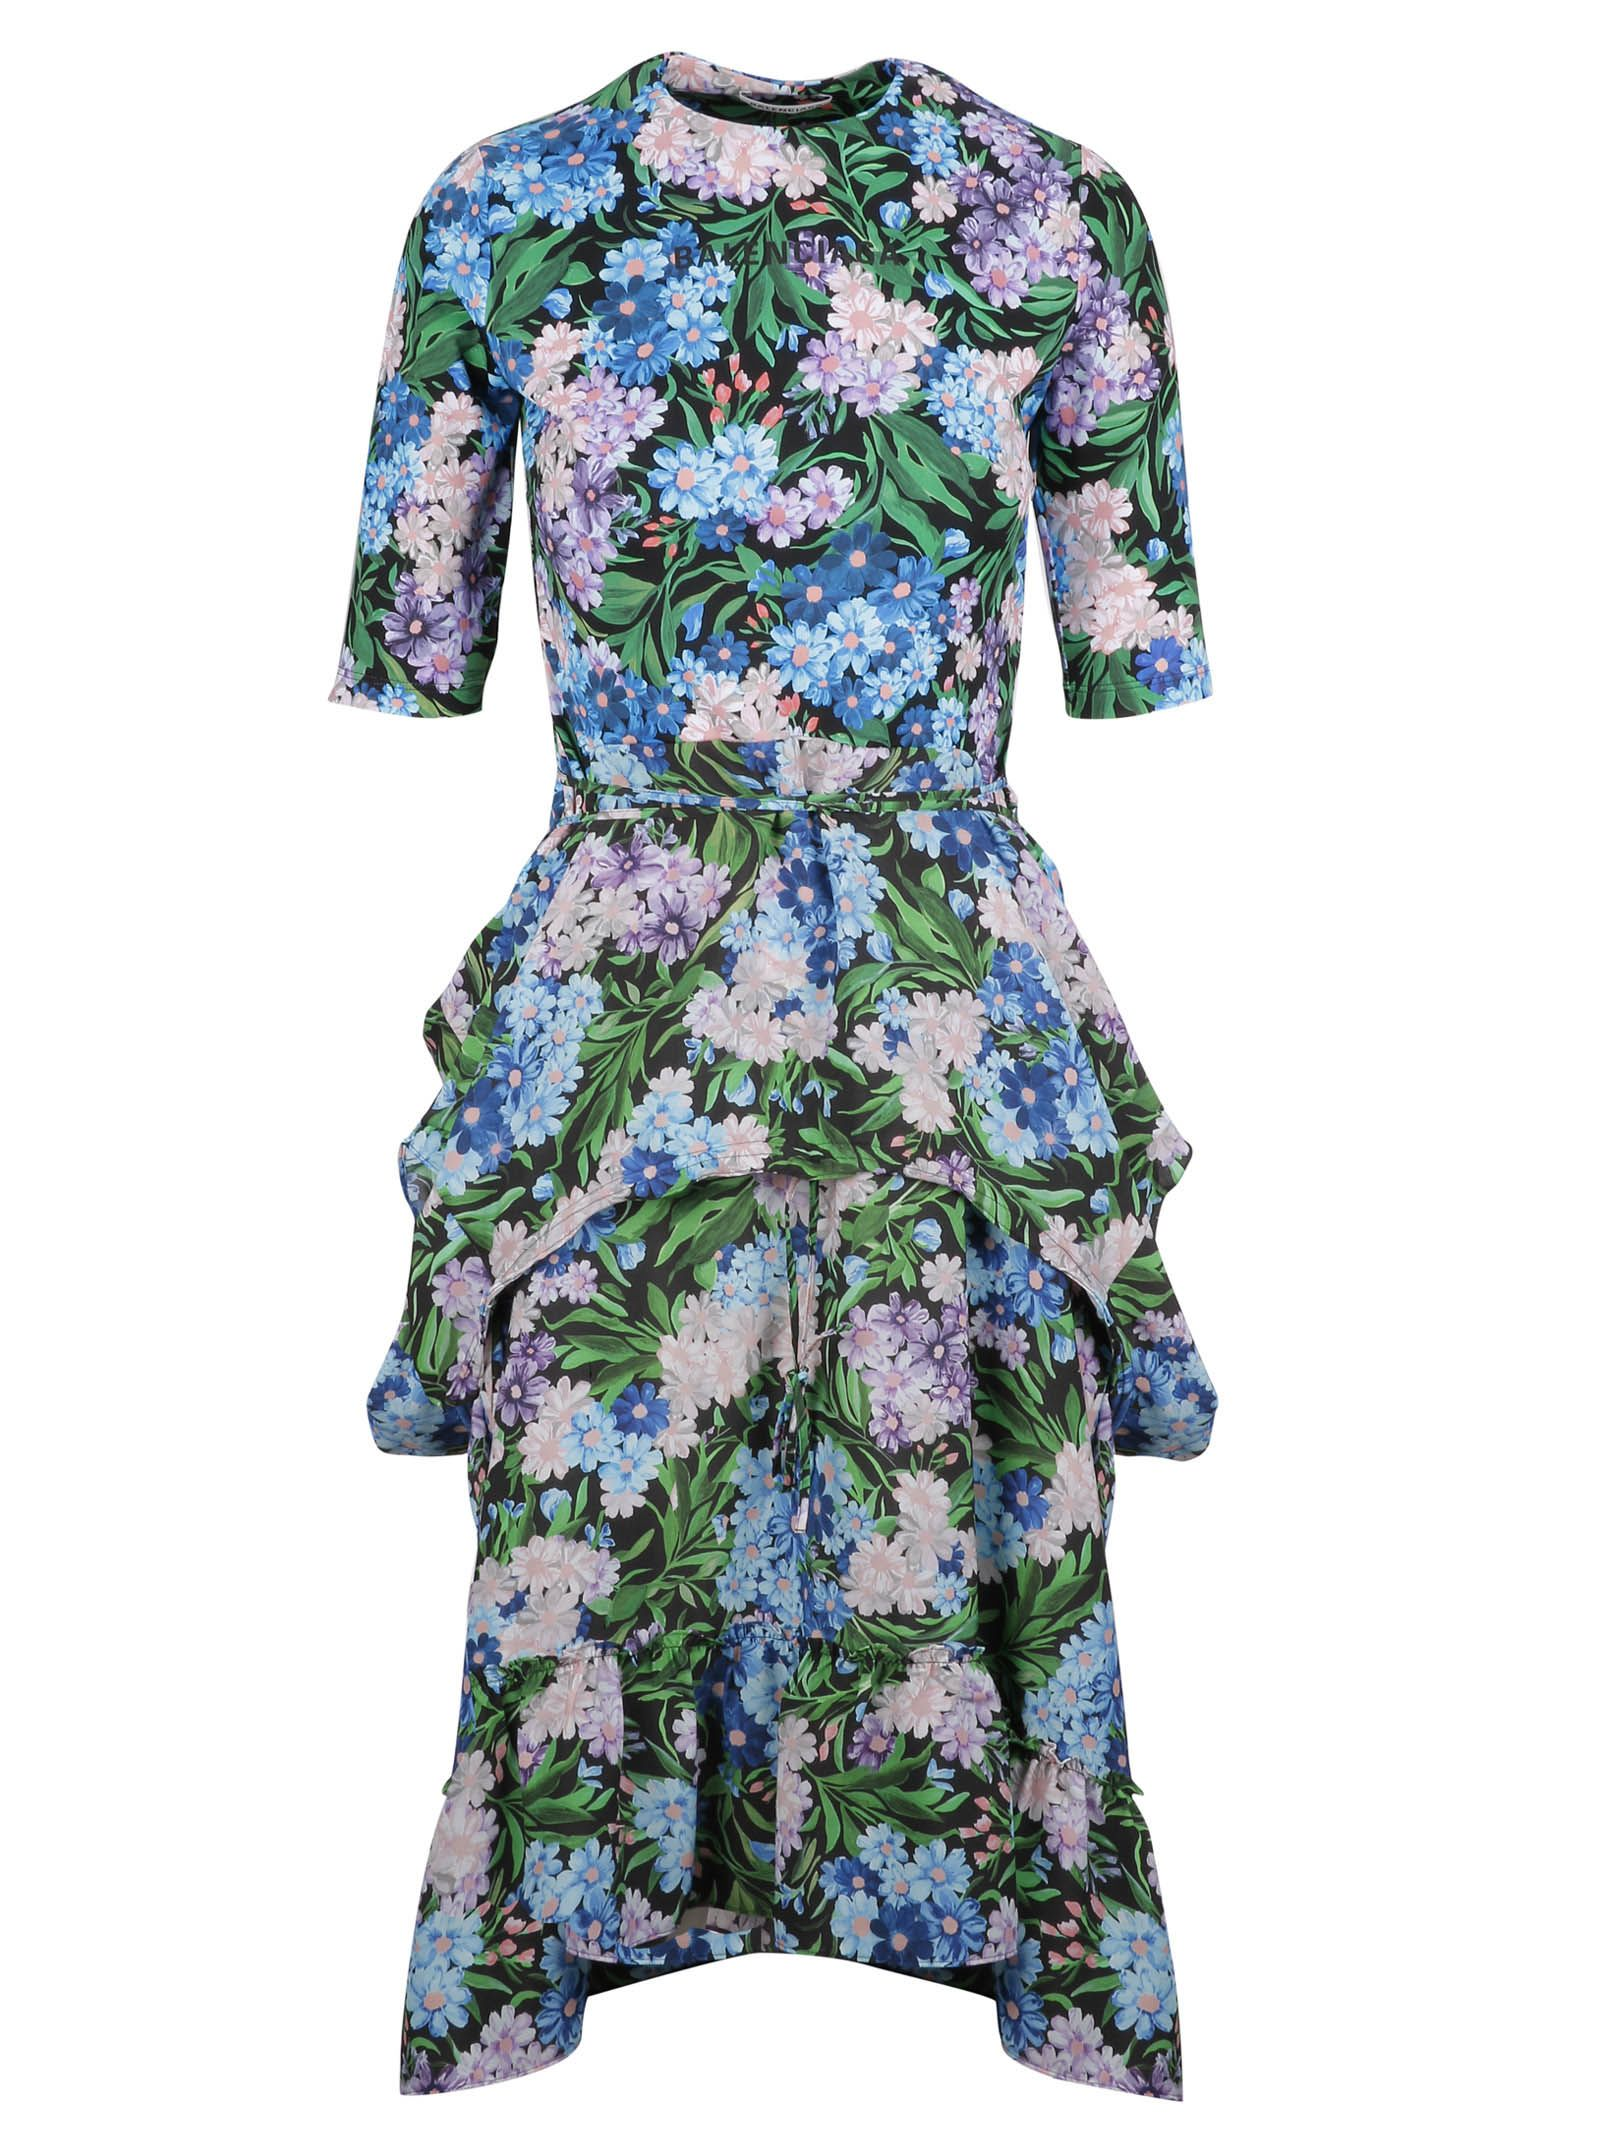 balenciaga -  Ruffled Floral Dress